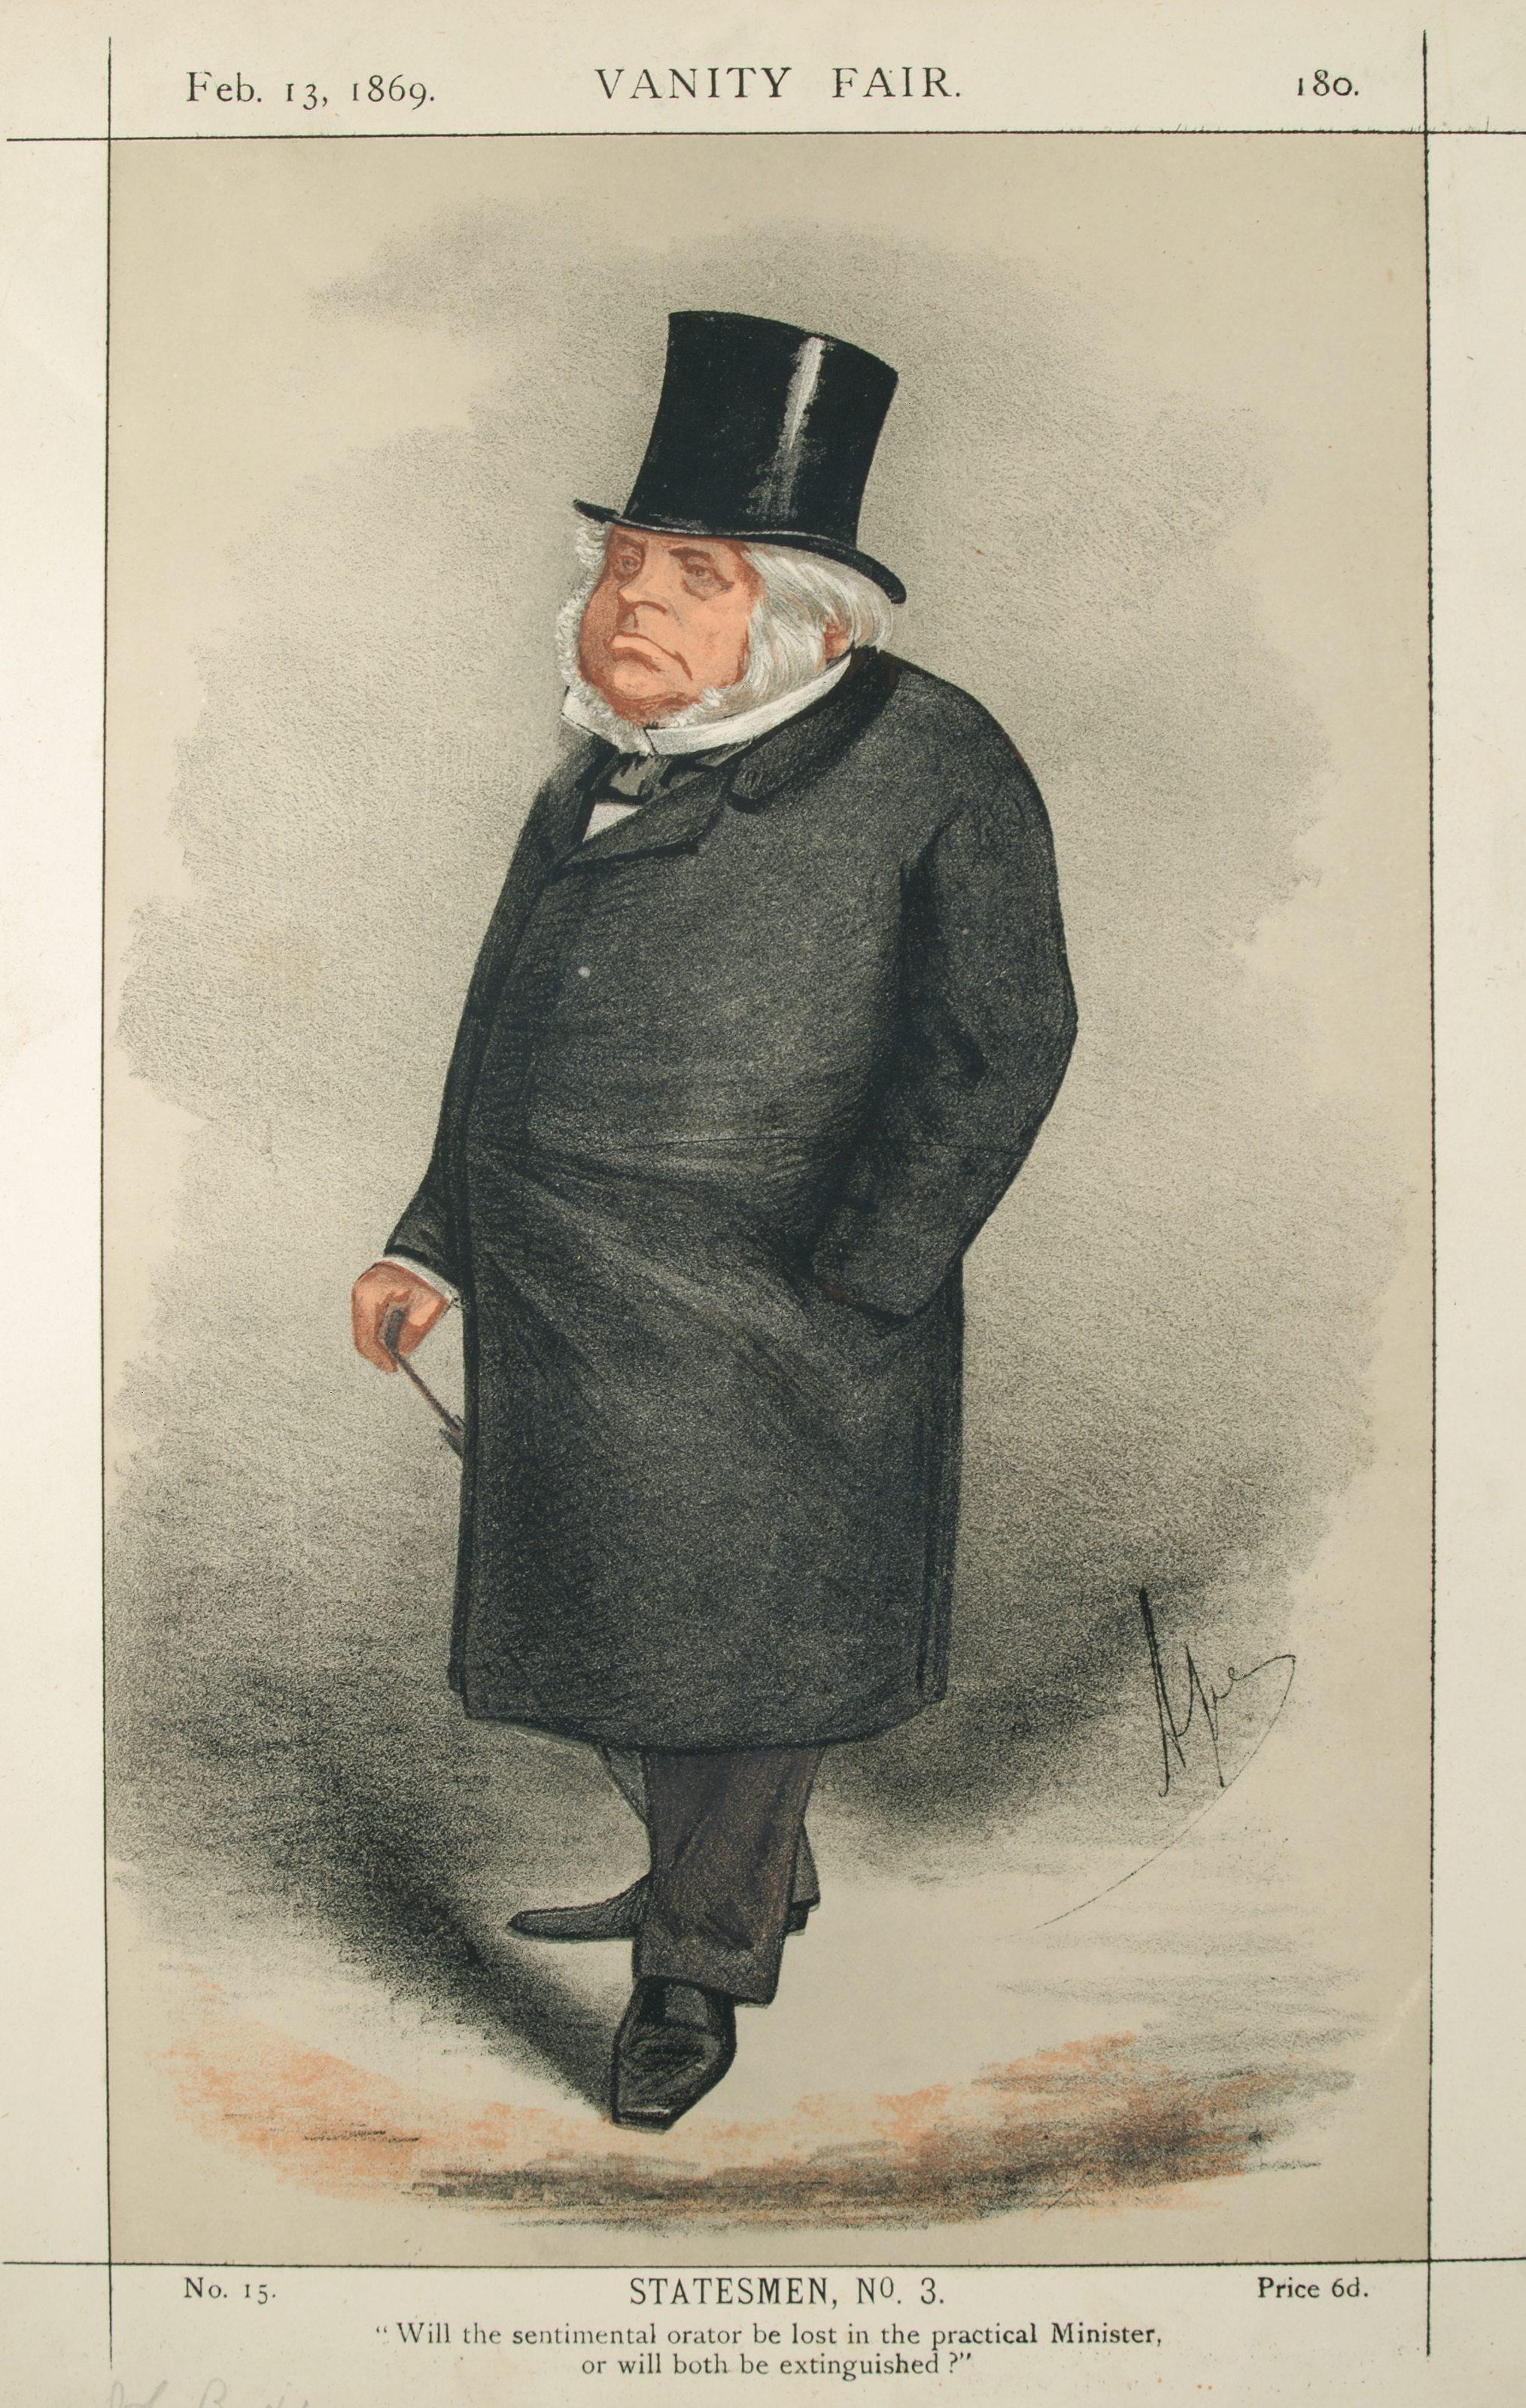 John_Bright,_Vanity_Fair,_1869-02-13.jpg